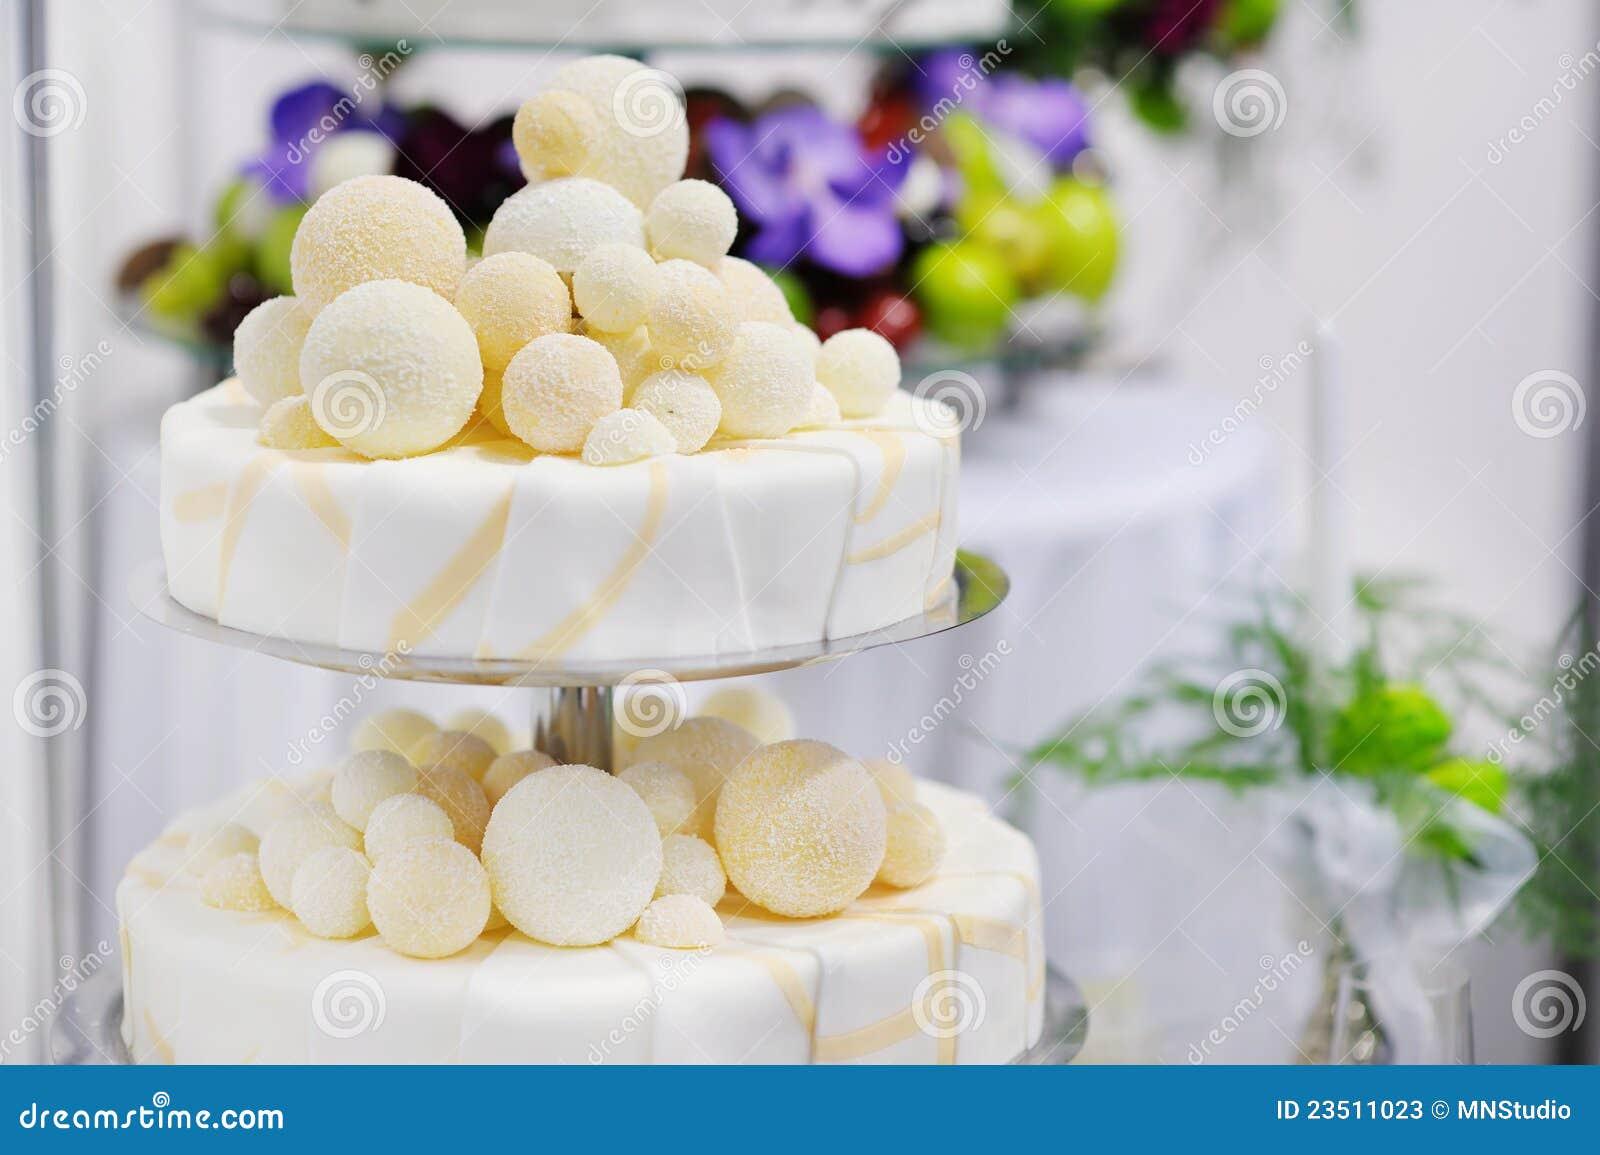 Fancy Wedding Cake Stock s Image